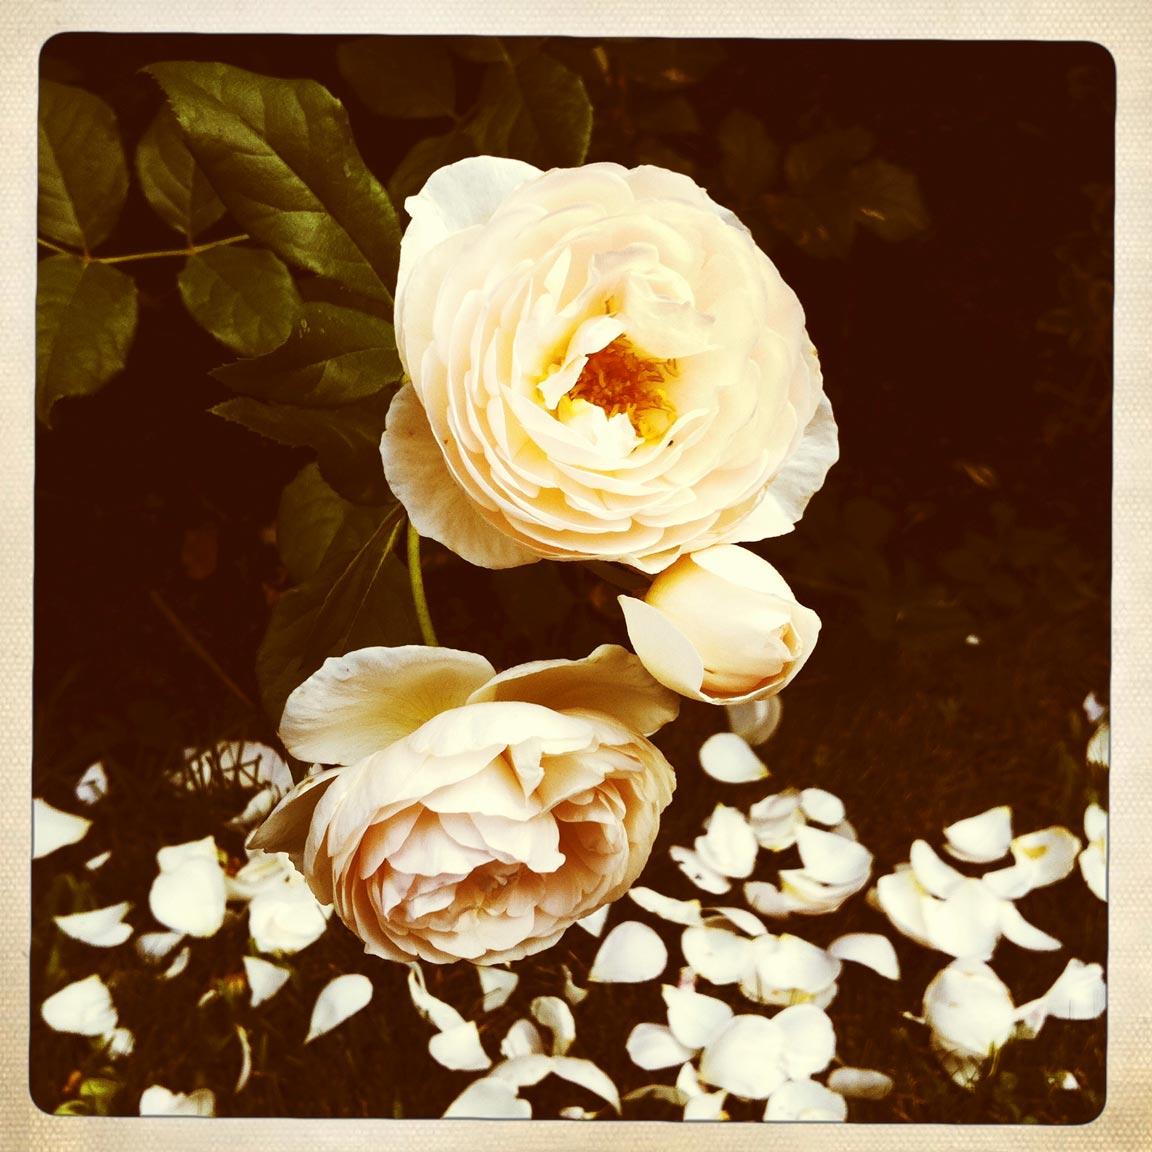 Roses2_2017-11-7